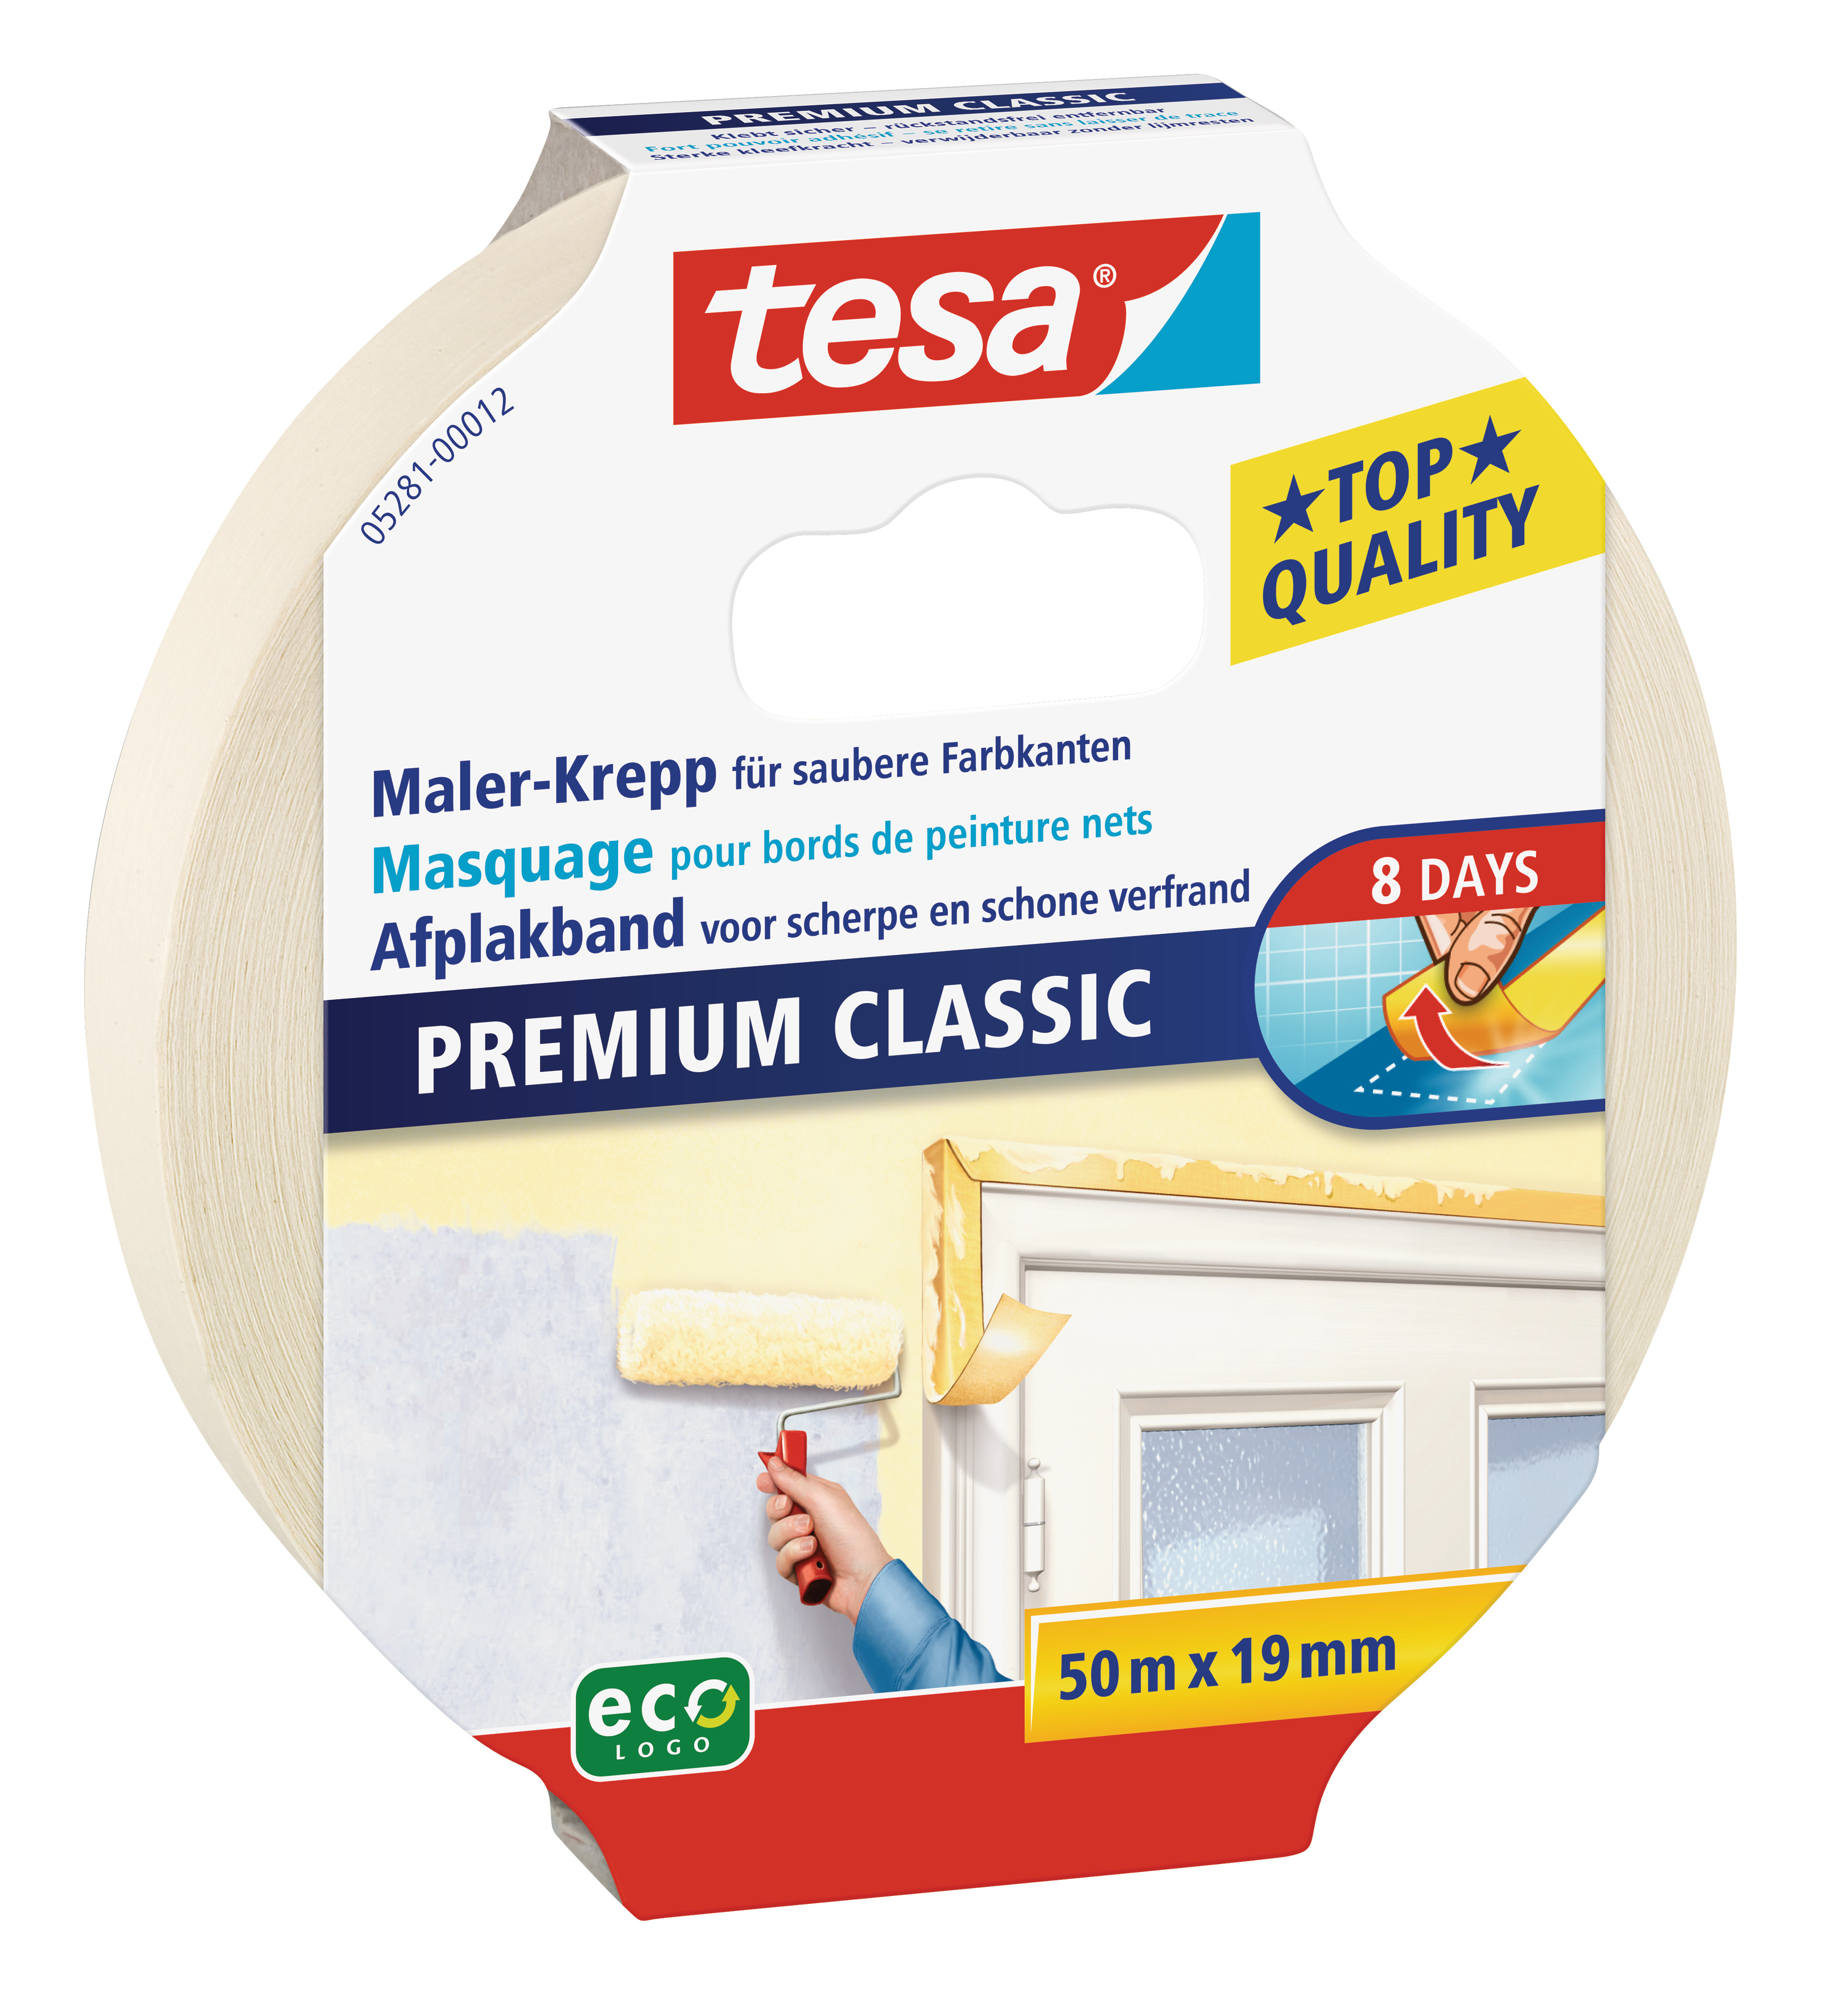 GP: 0,04 EUR/m tesa Maler-Krepp Premium Classic 50m x 19mm